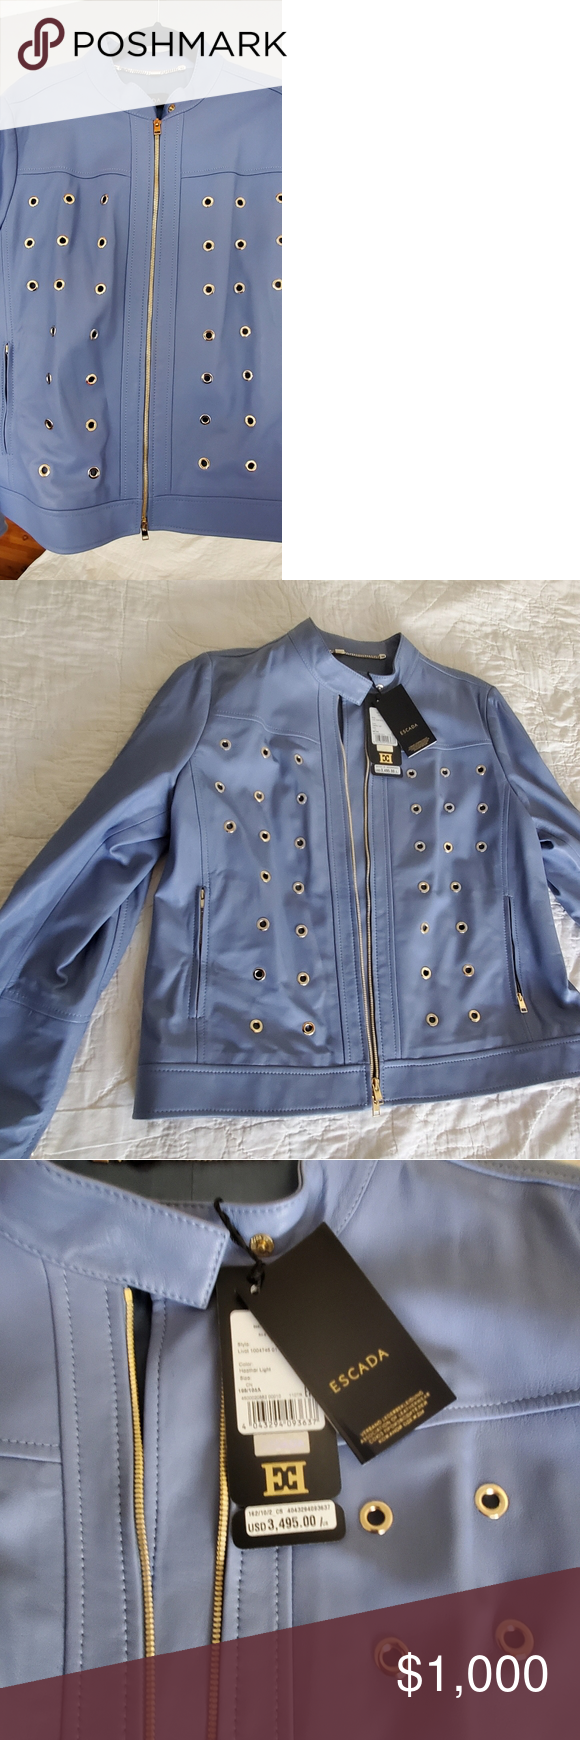 Luxury Nwt Escada Leather Jacket Periwinkle Xl Leather Jacket Jackets Periwinkle Color [ 1740 x 580 Pixel ]